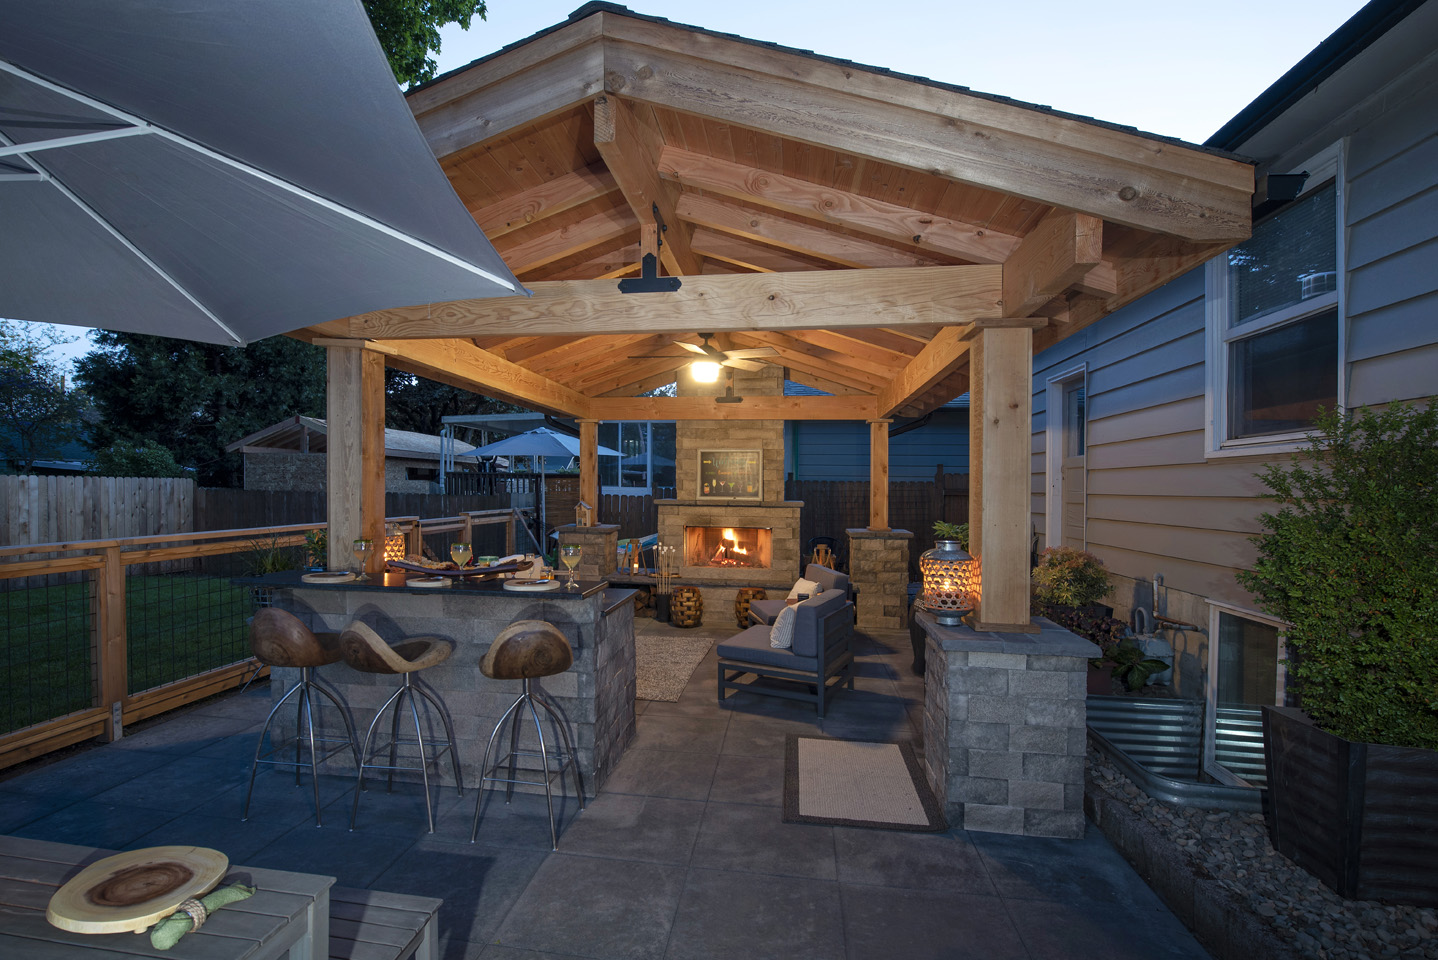 Backyard Patio Designs - Paradise Restored Landscaping on Backyard Patio  id=87608